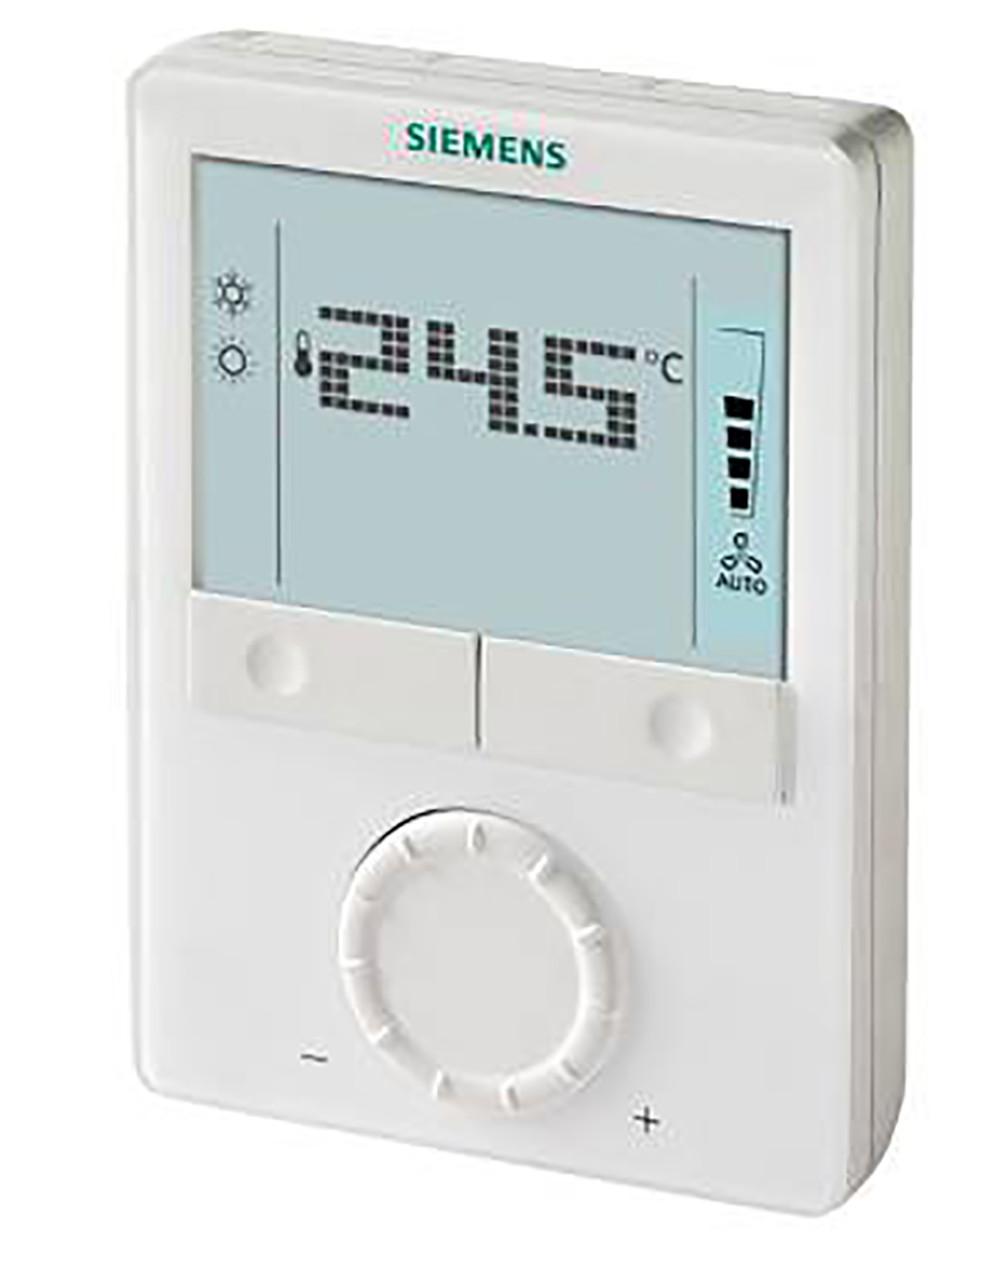 Siemens RDG100, S55770-T158 Room thermostat